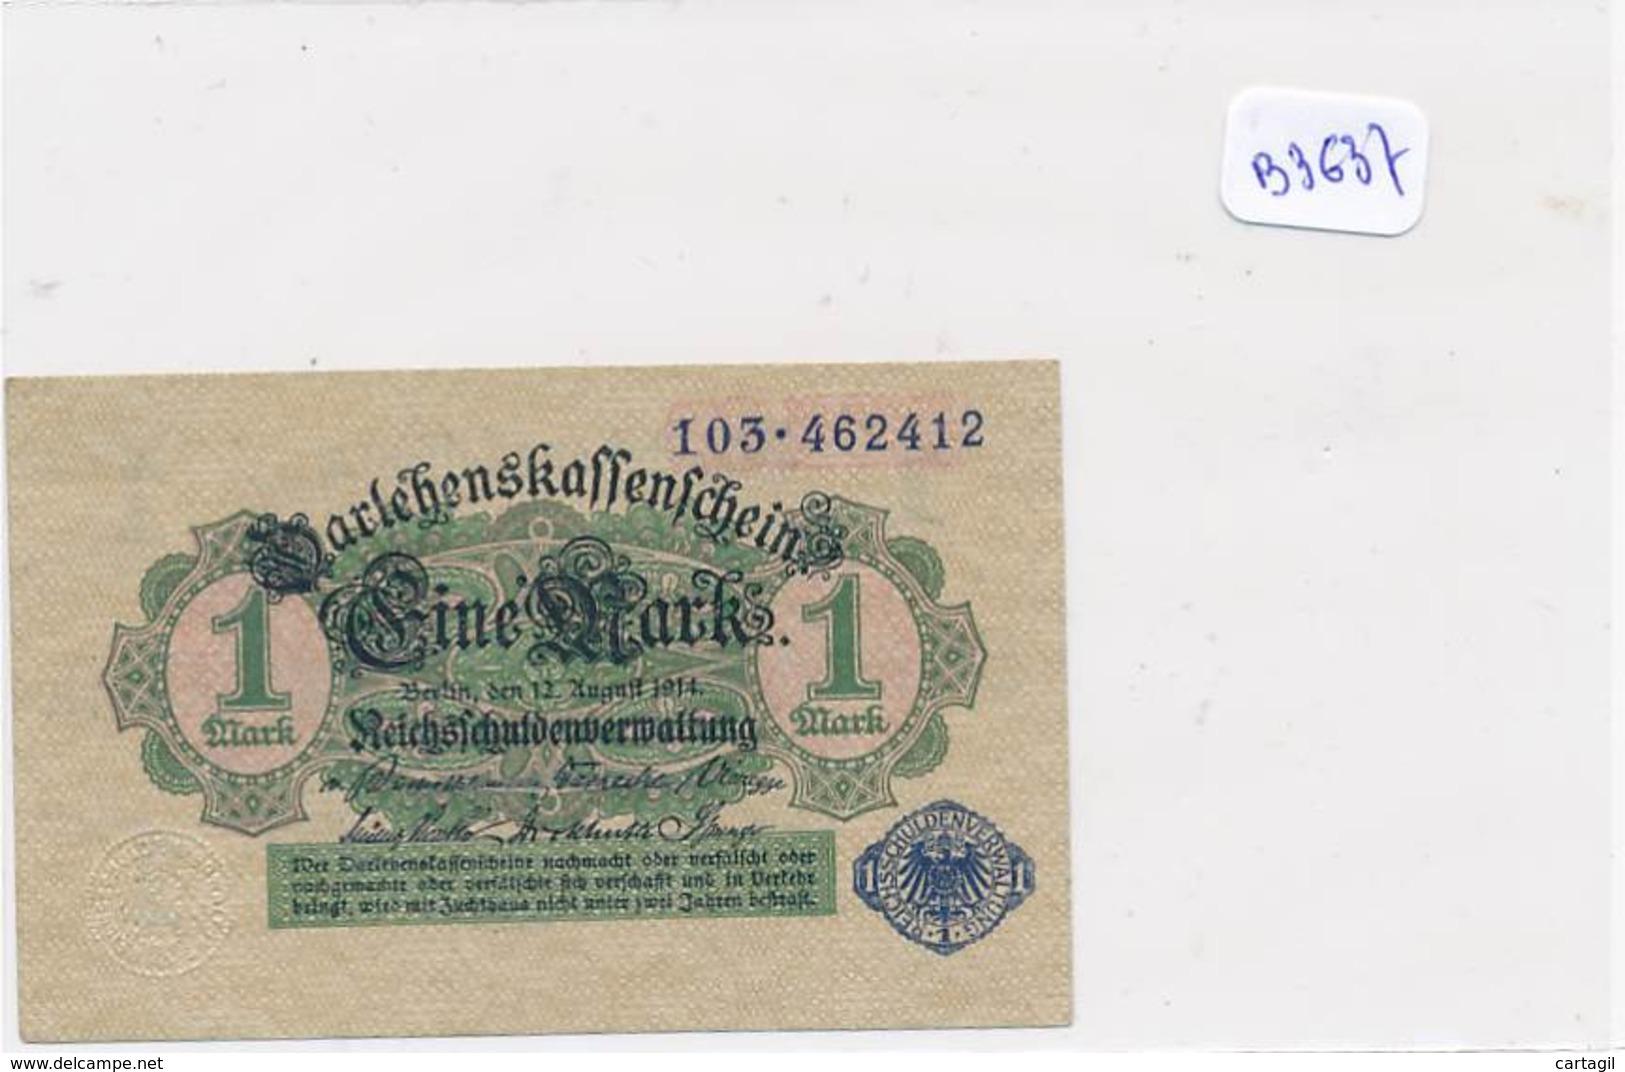 Numismatique -B3637 -Allemagne -1Mark Darlehnskassenshein 1914 ( Catégorie,  Nature état ... Scans)-Envoi Gratuit - Altri